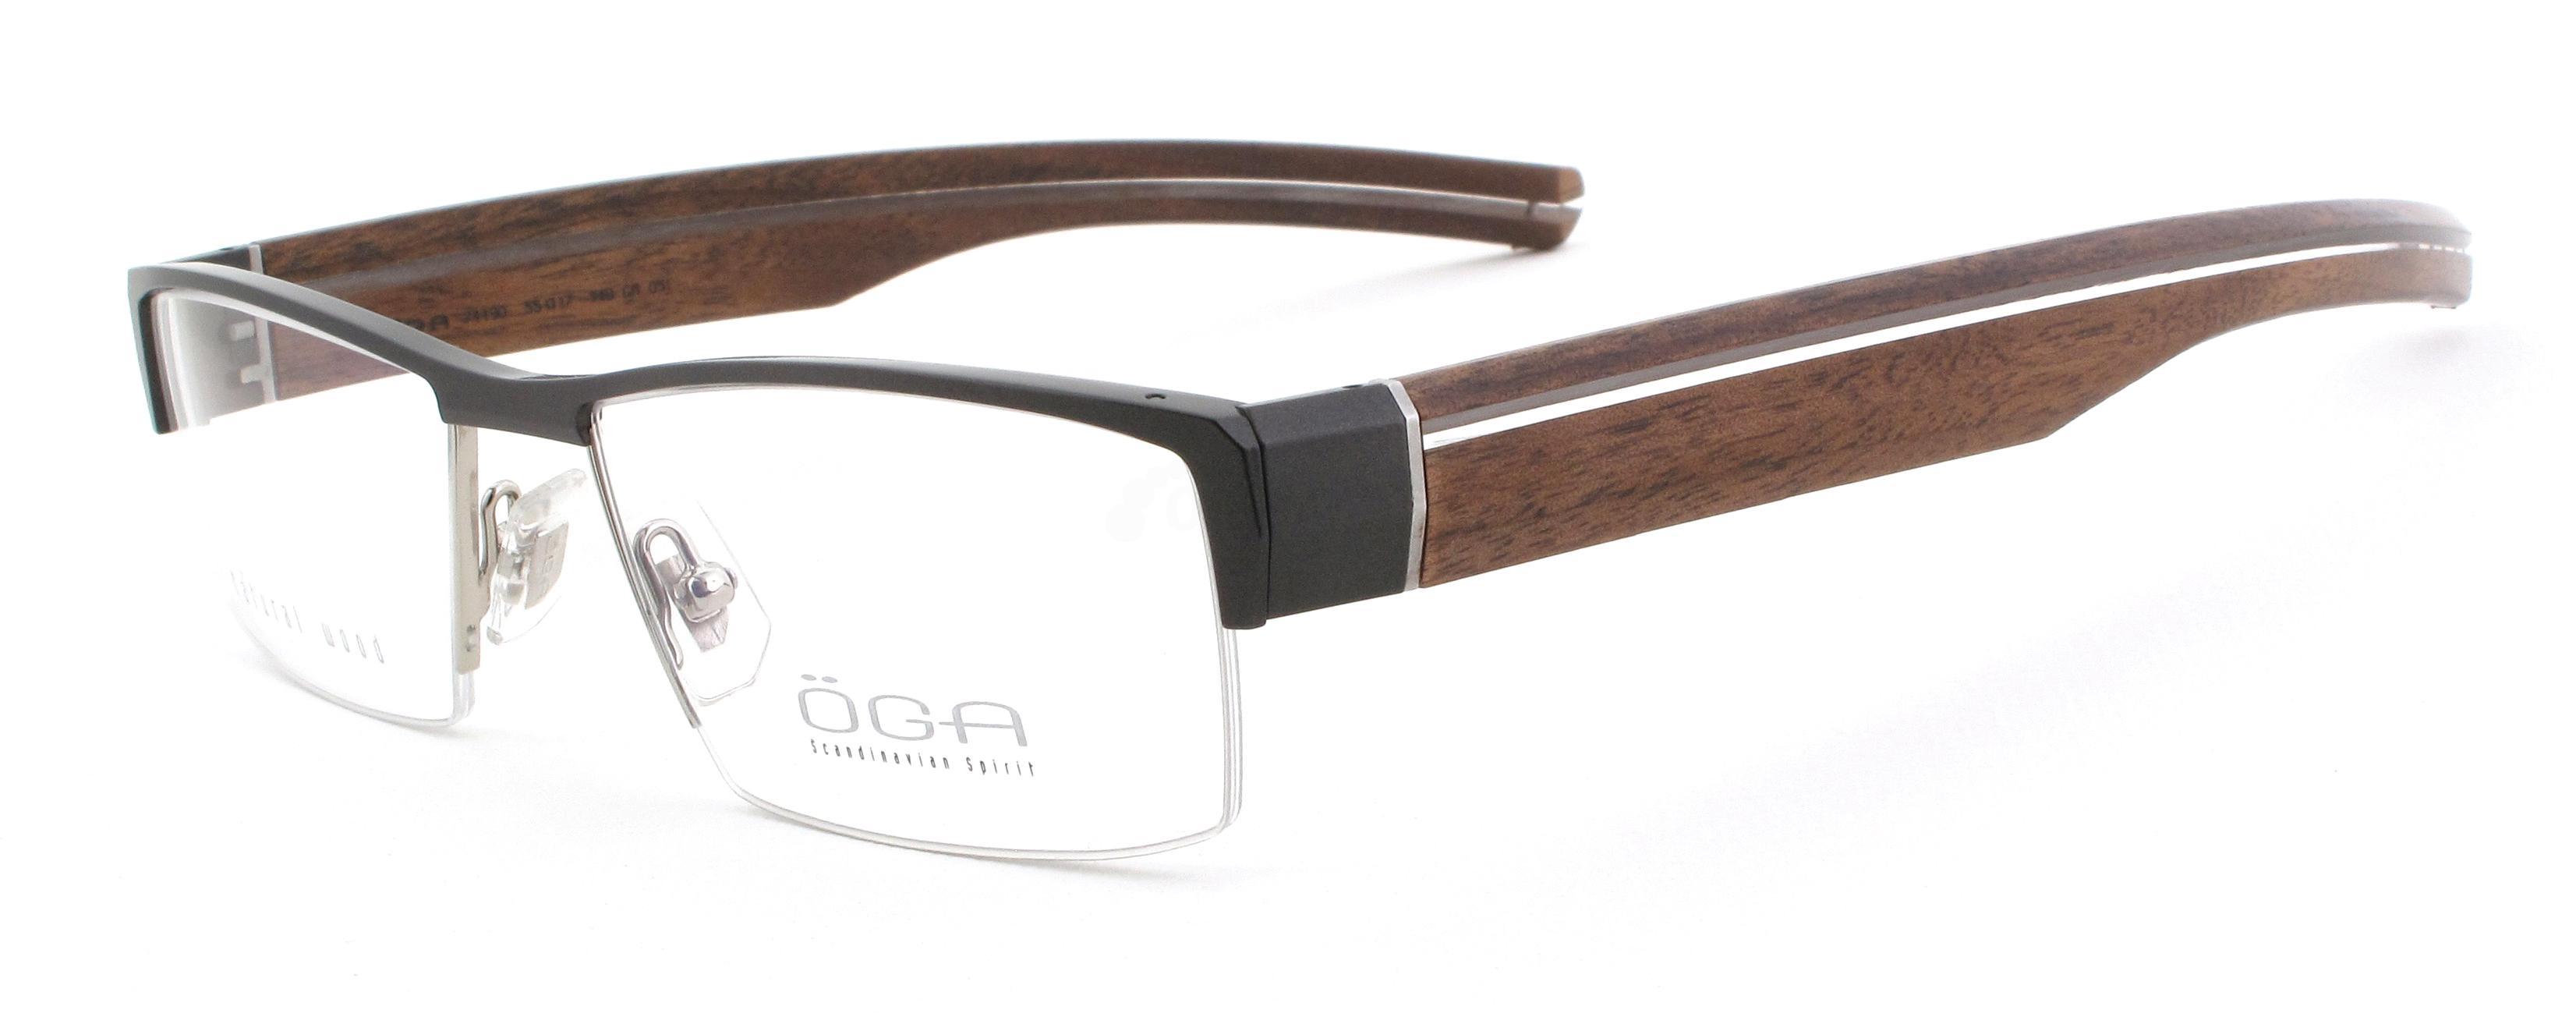 GM051 7449O GLASTRA Glasses, ÖGA Scandinavian Spirit